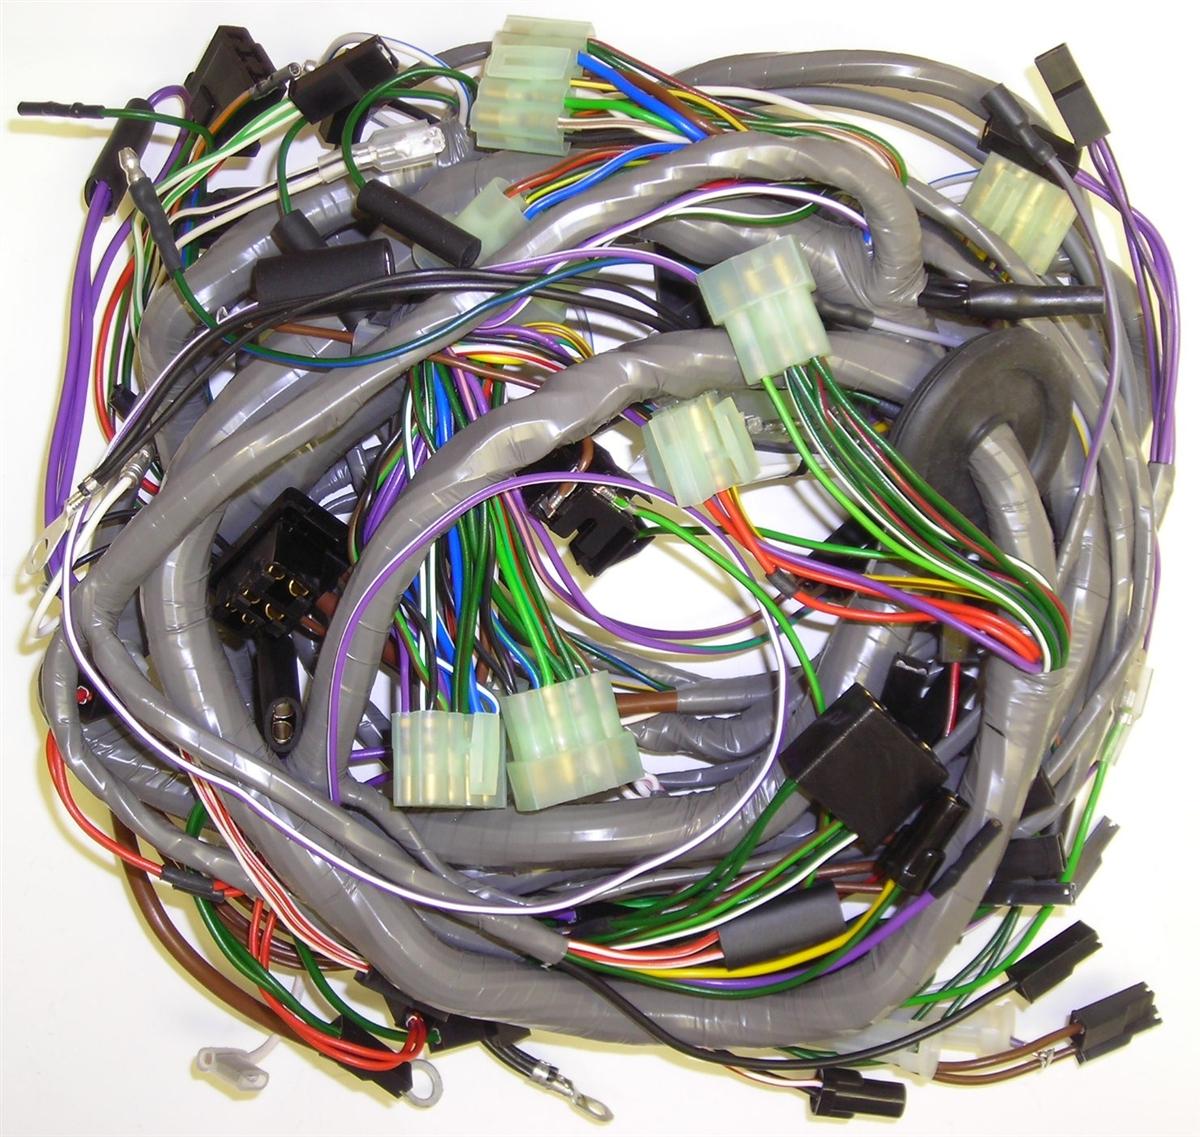 hight resolution of main wiring harness mg midget 1977 80 ca spec 1757 1977 mg midget wiring harness mg midget wiring harness